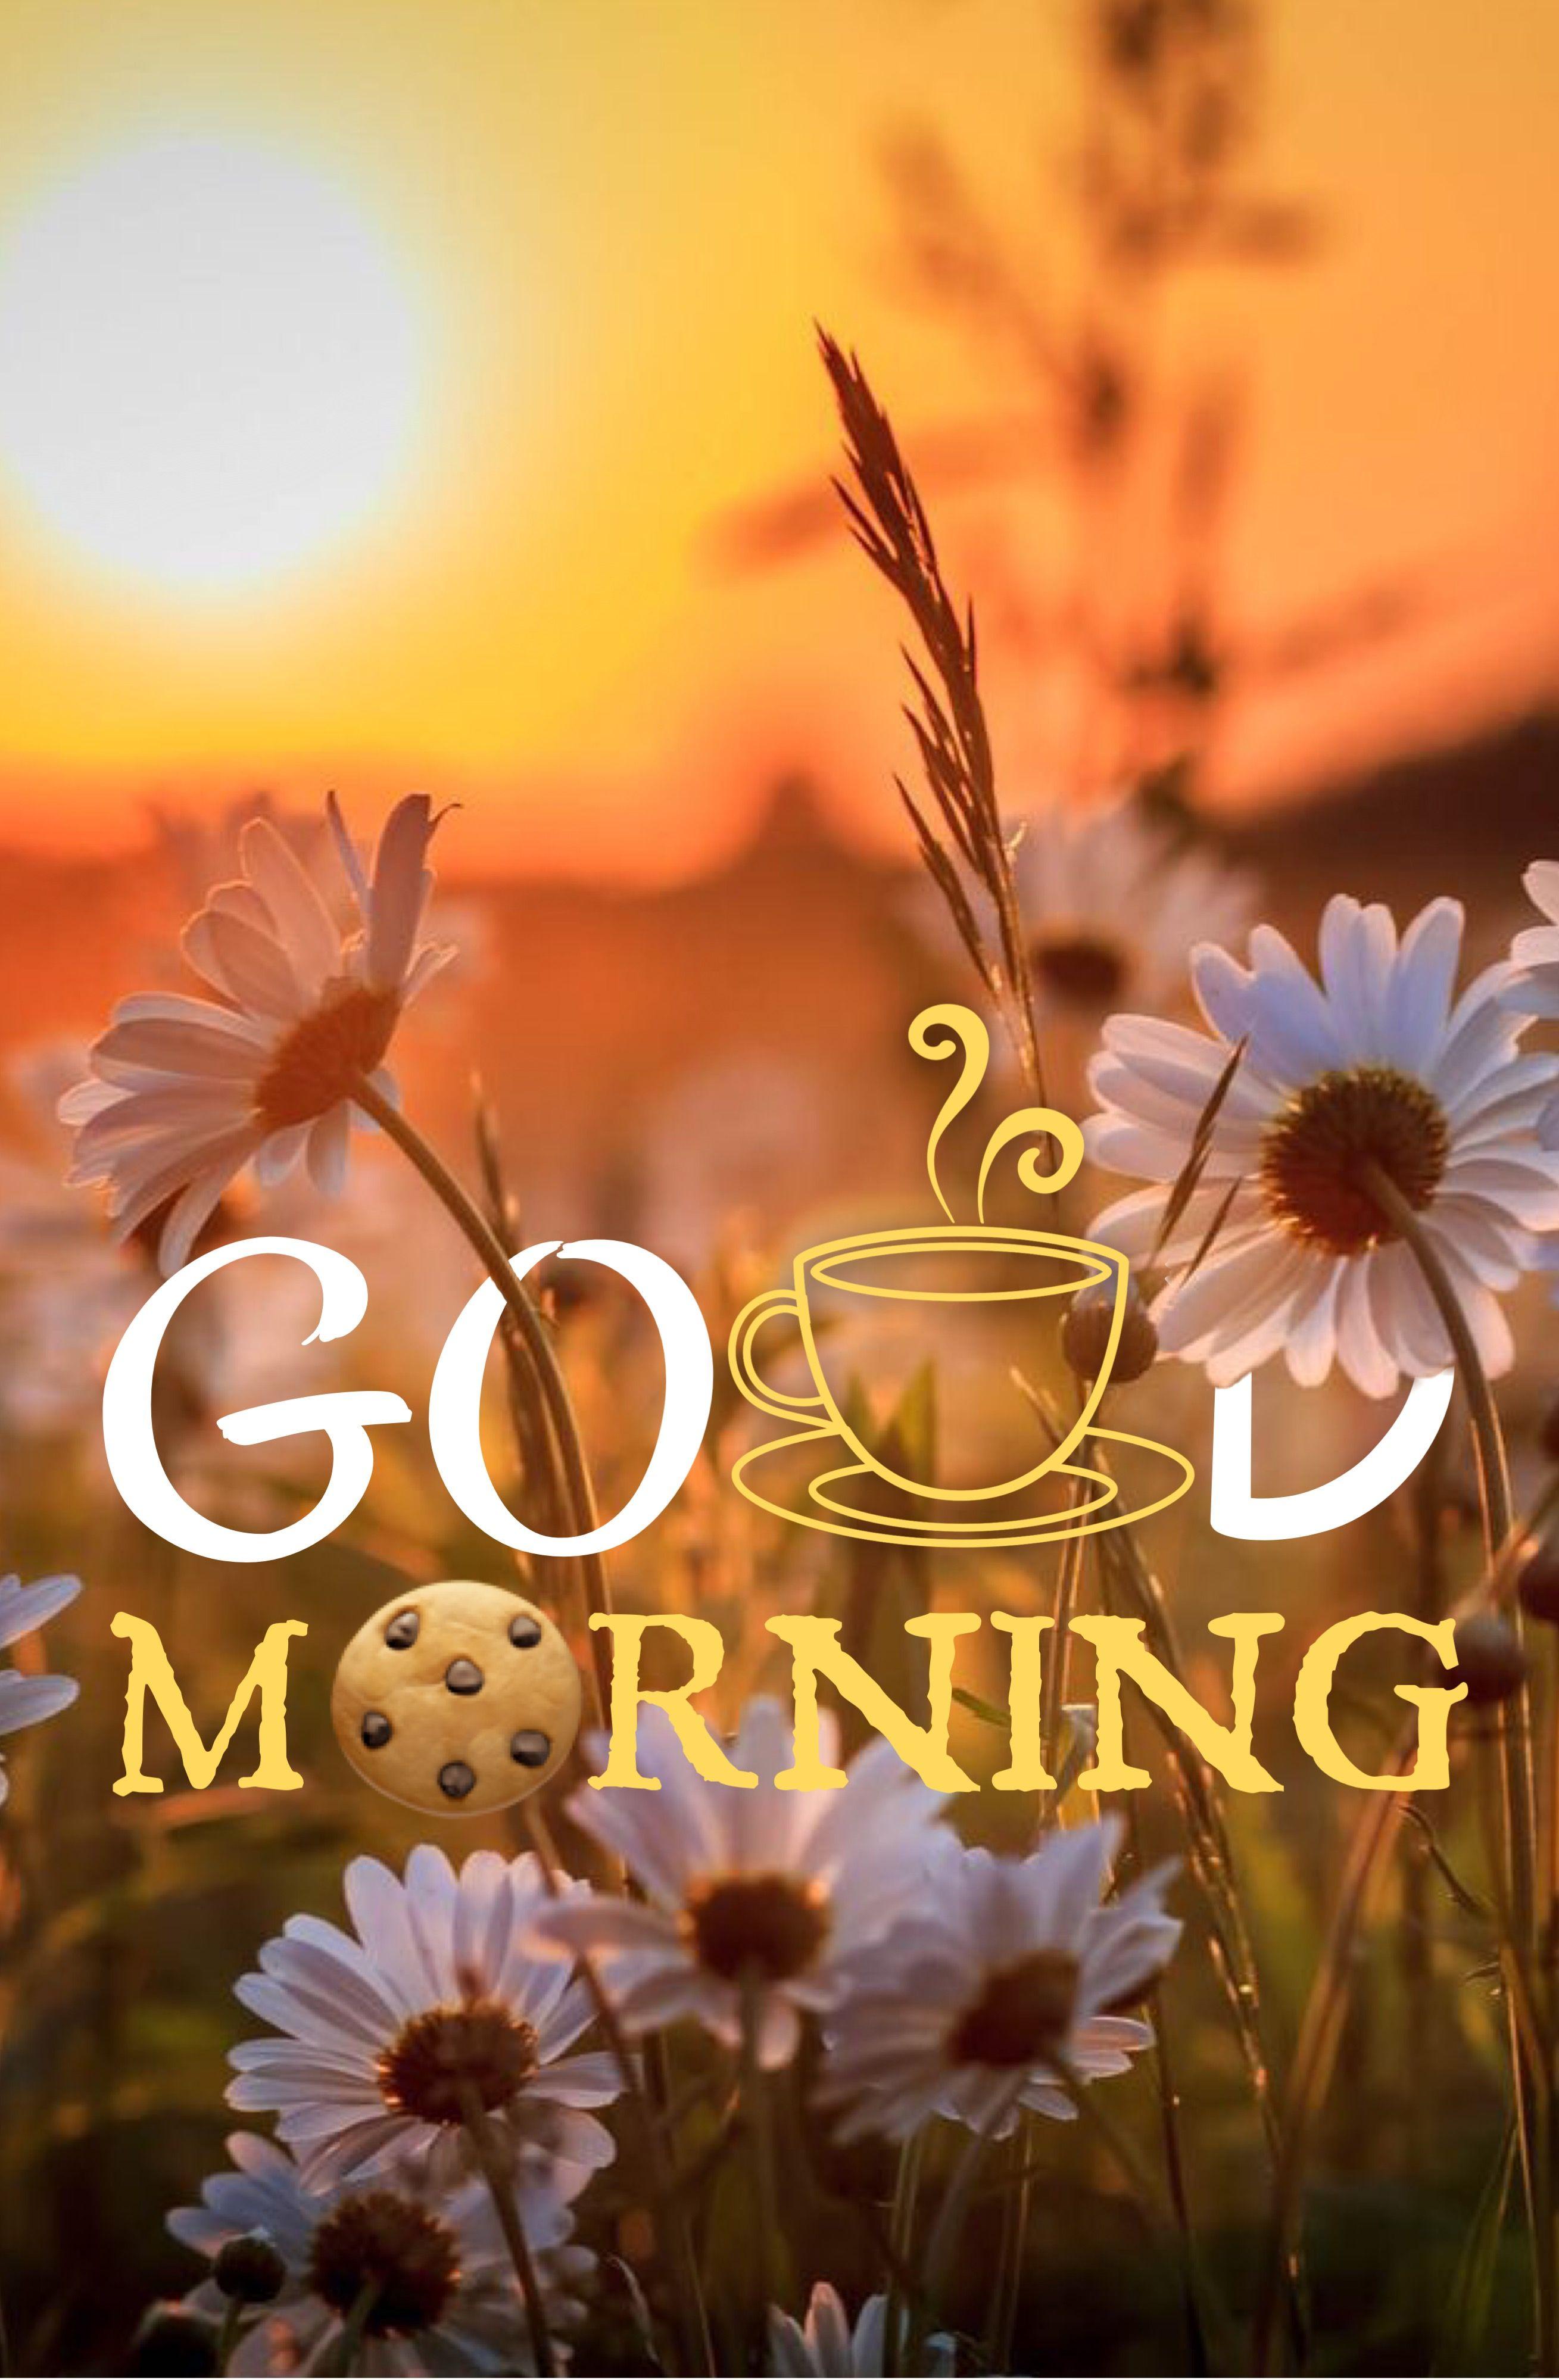 Good morning greetings, Good morning quotes, Cute good